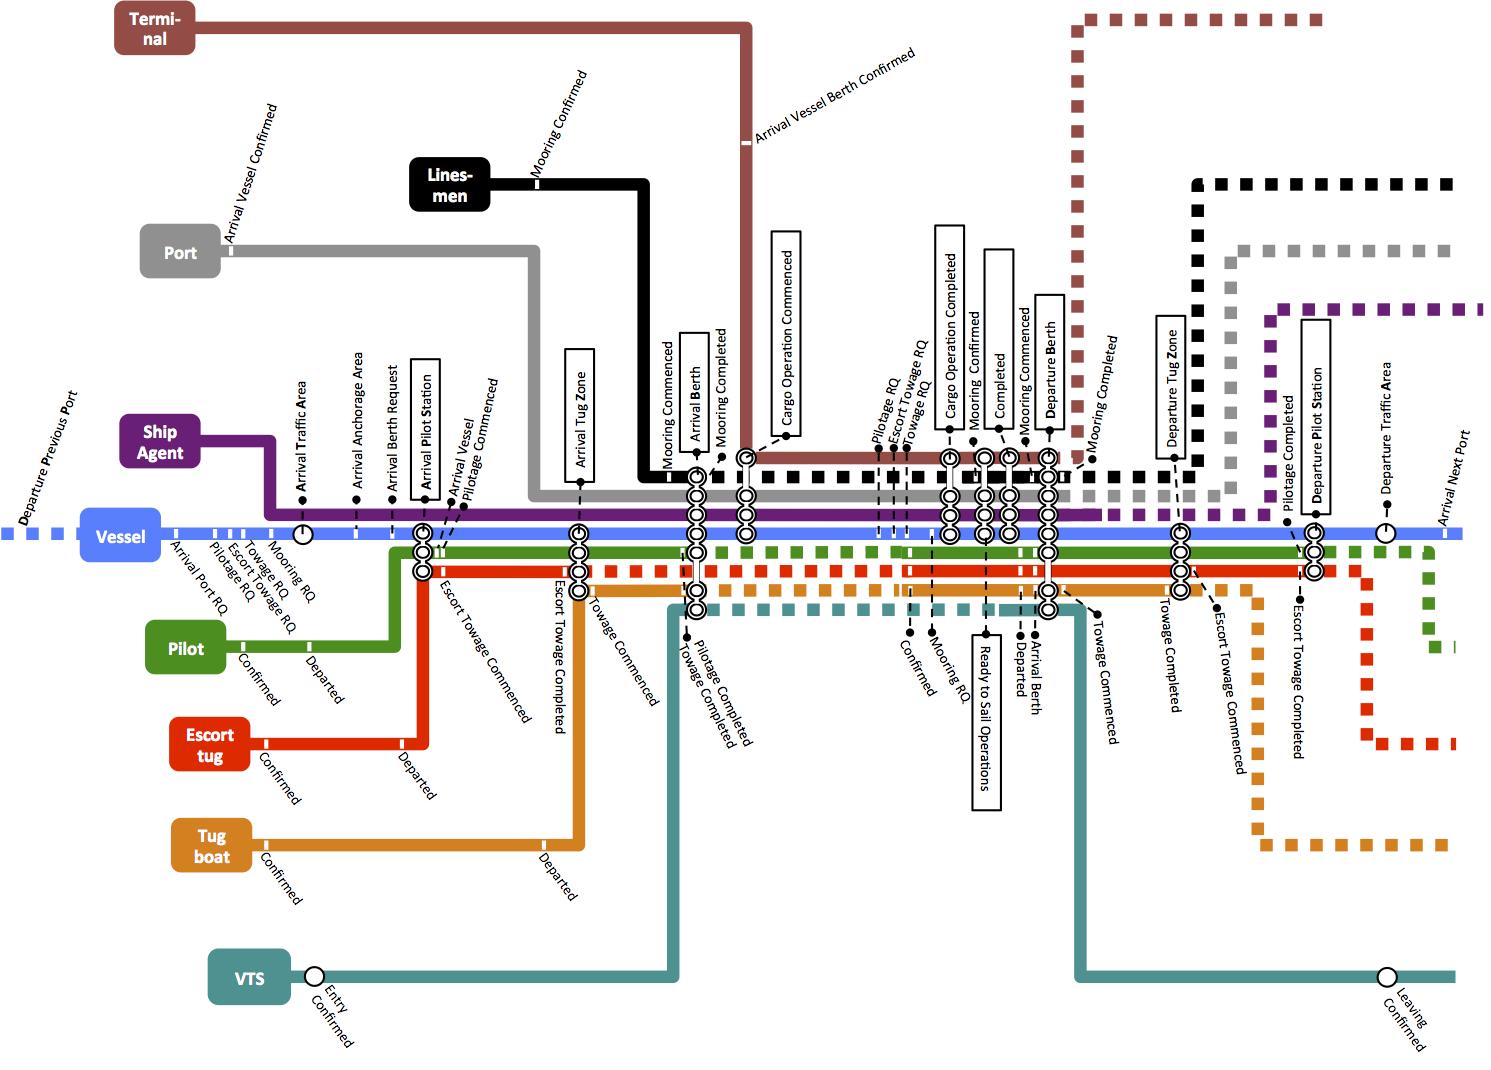 Stcum Metro Map.Subway Map Port Cdm Stm Sea Traffic Management Validation